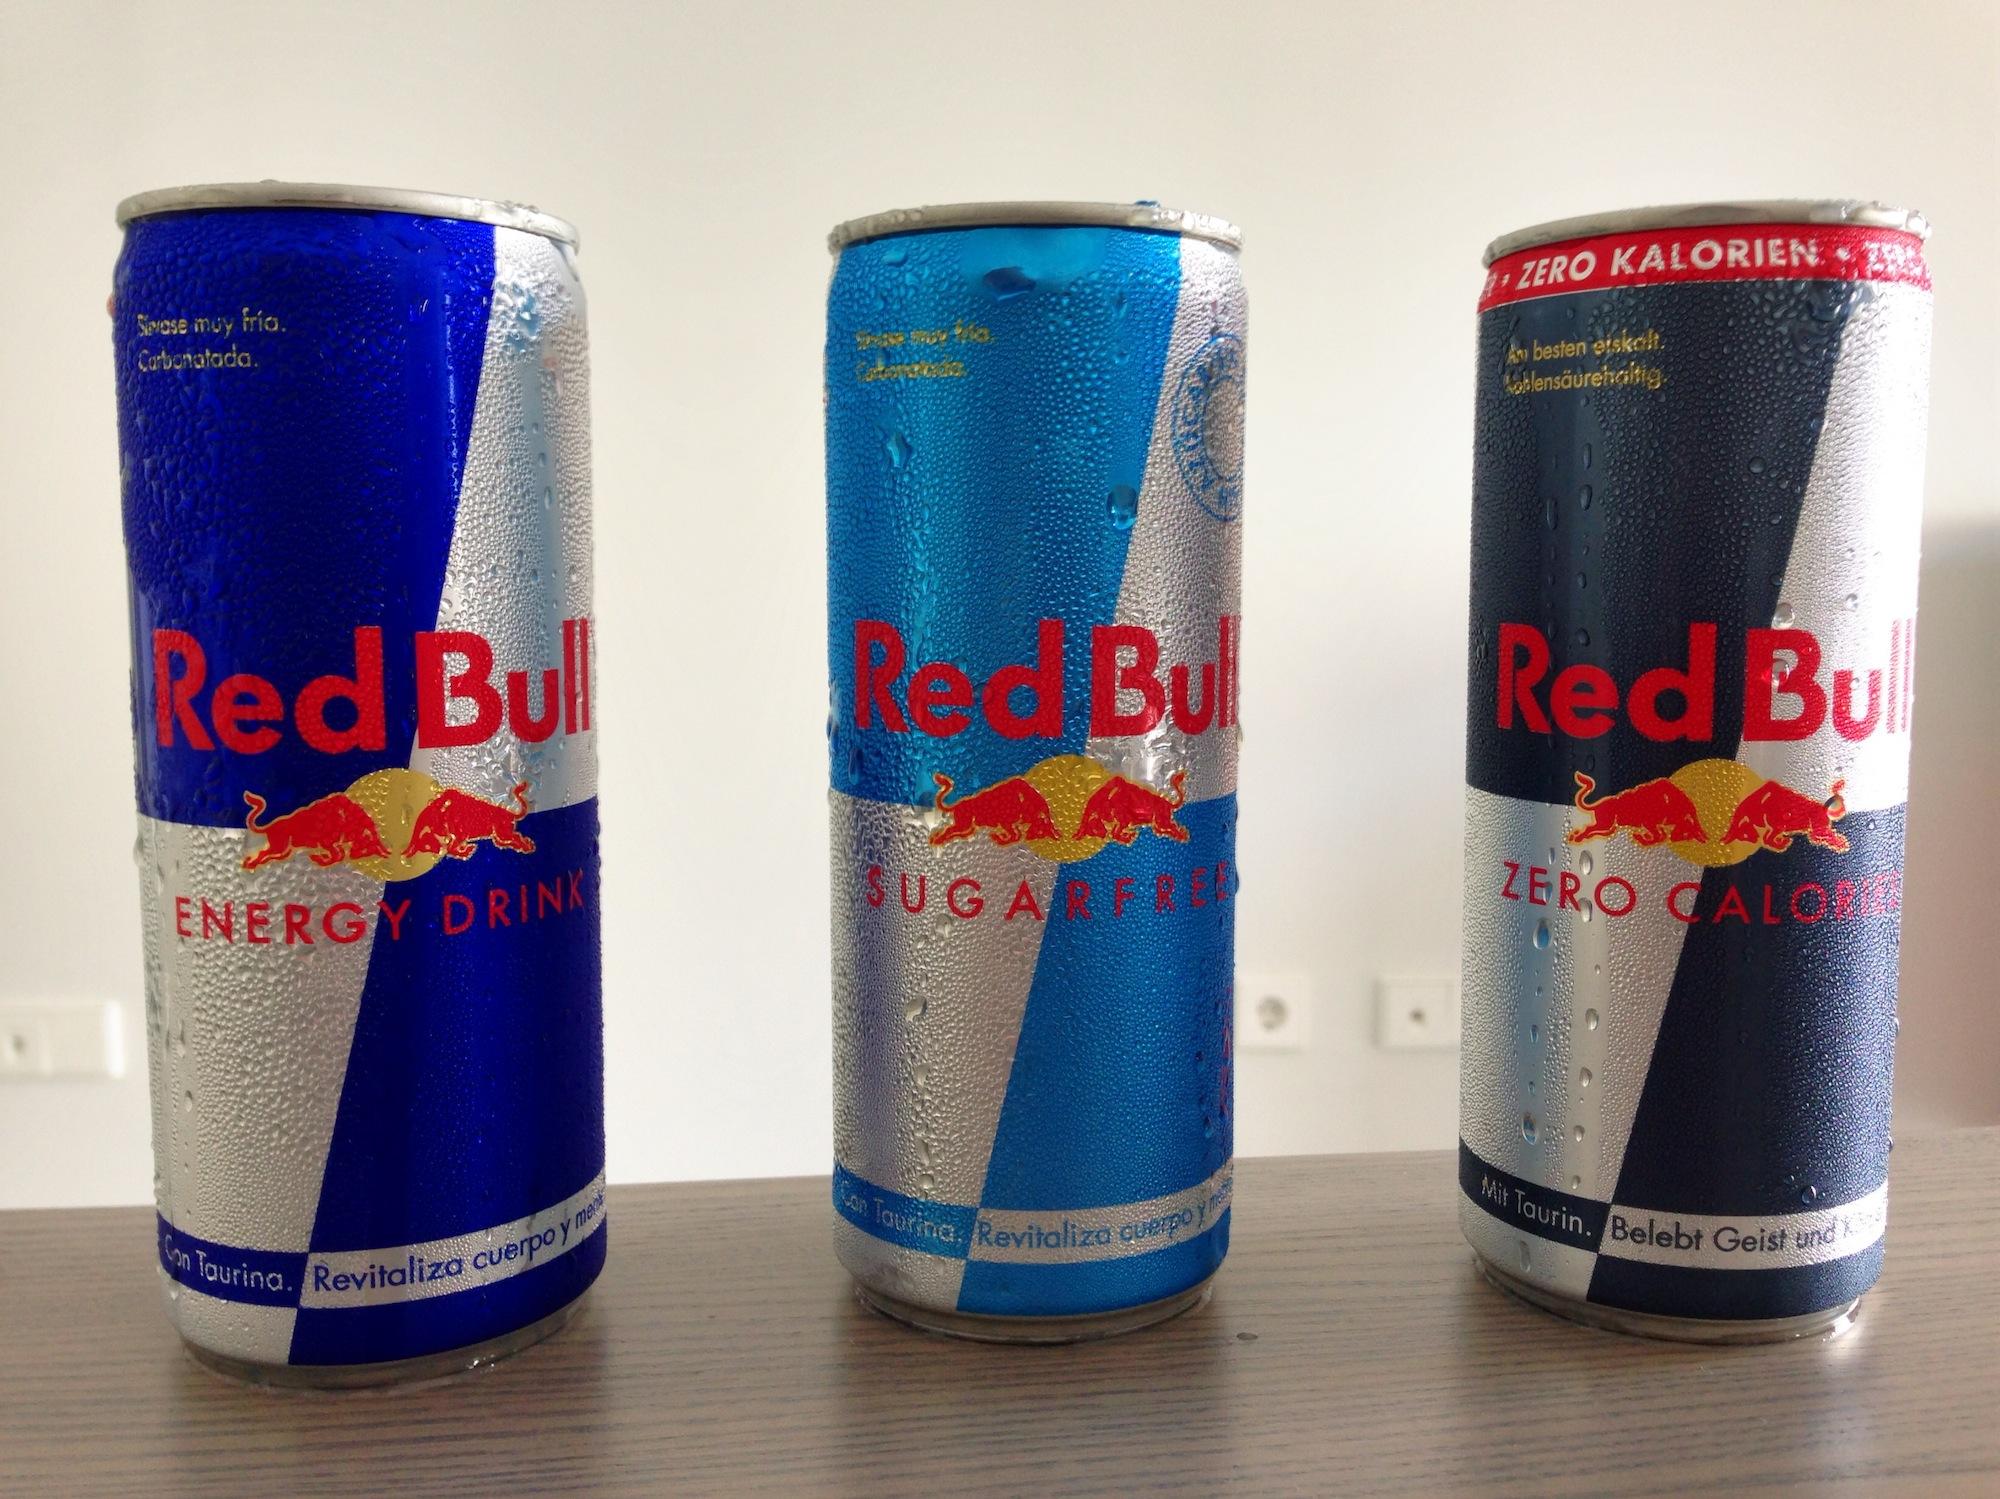 Ausprobiert: Red Bull Zero Calories